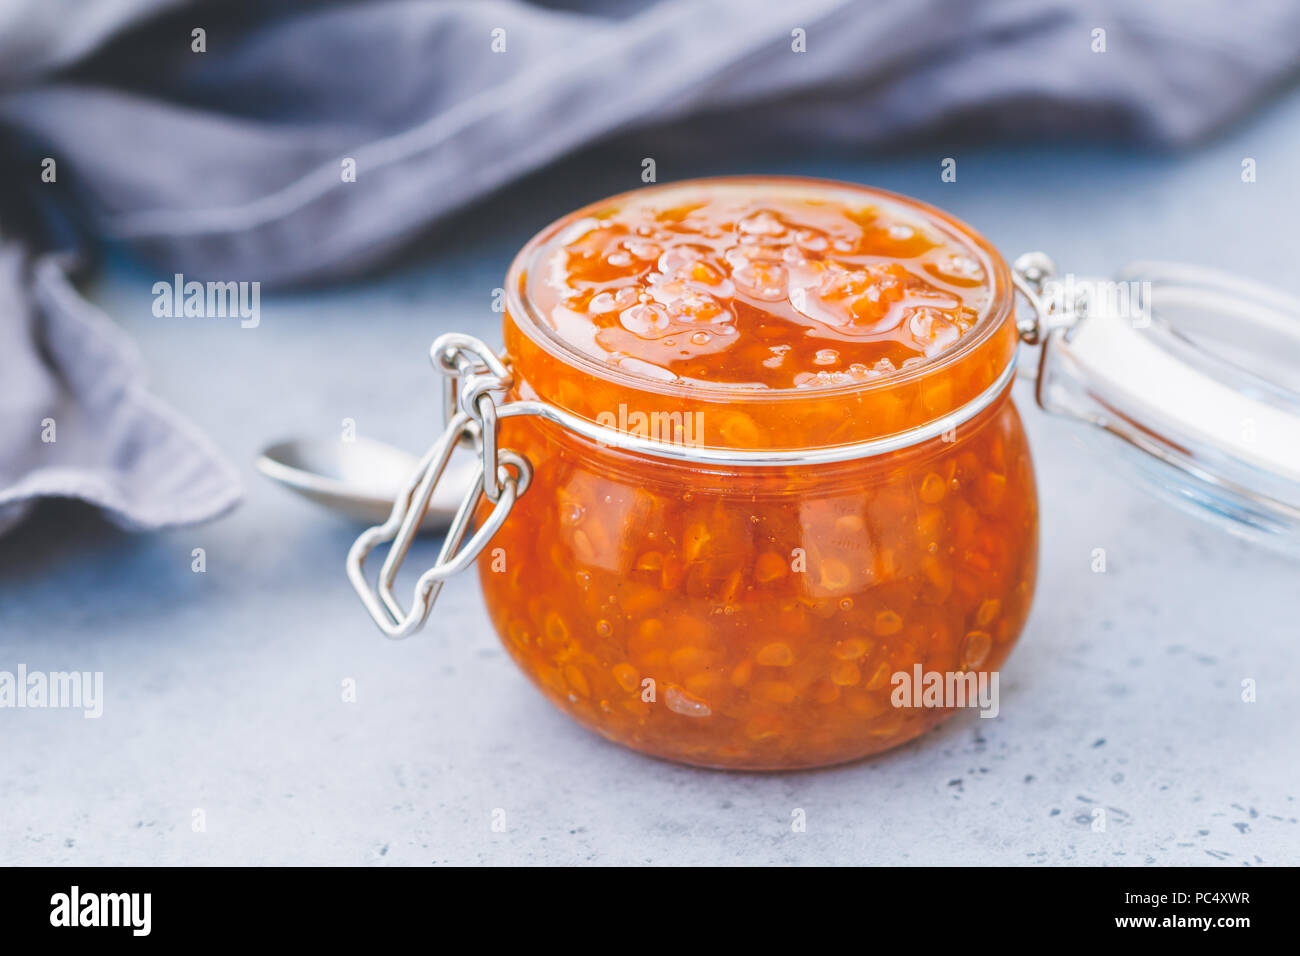 Glass jar with cloudberry jam. Nordic cuisine. Stock Photo